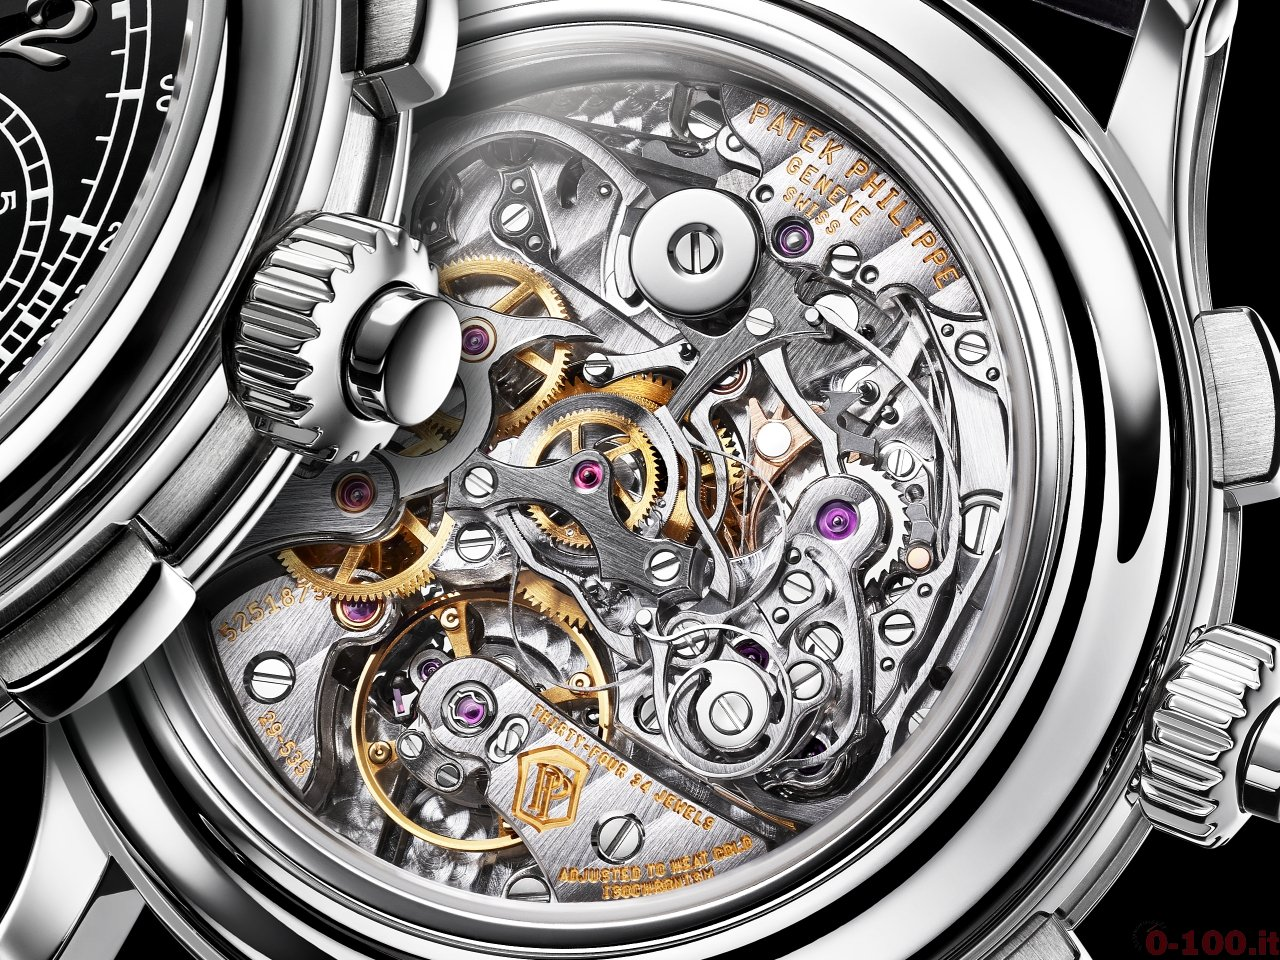 baselworld-2015-patek-philippe-cronografo-rattrappante-0-100_4